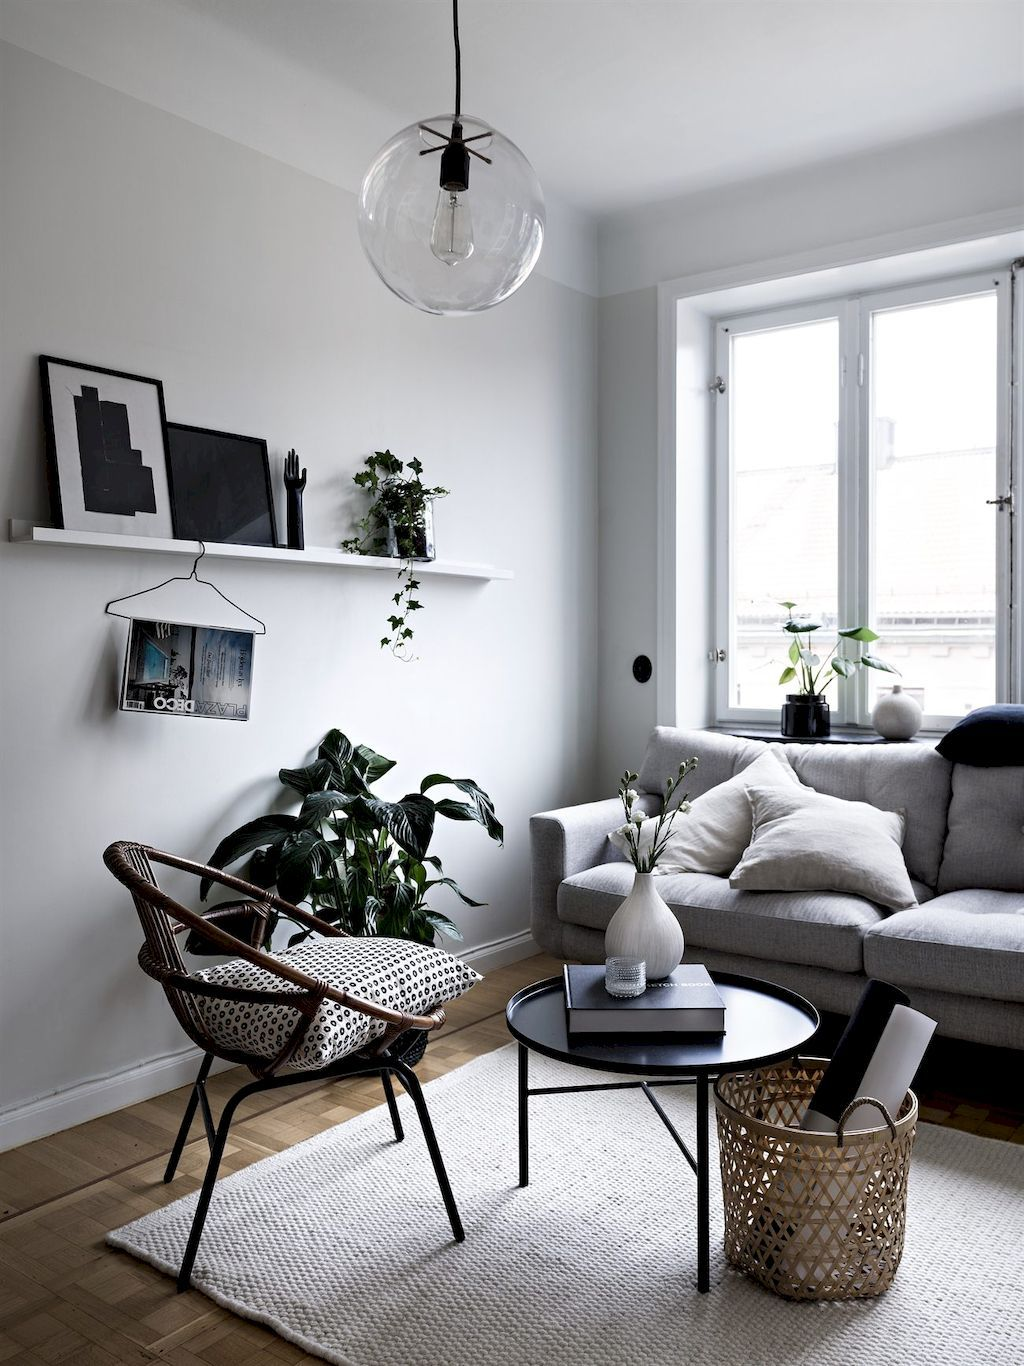 75 Stunning Scandinavian Living Room Decorating Ideas   Living Rooms,  Scandinavian Living Rooms And Scandinavian Living